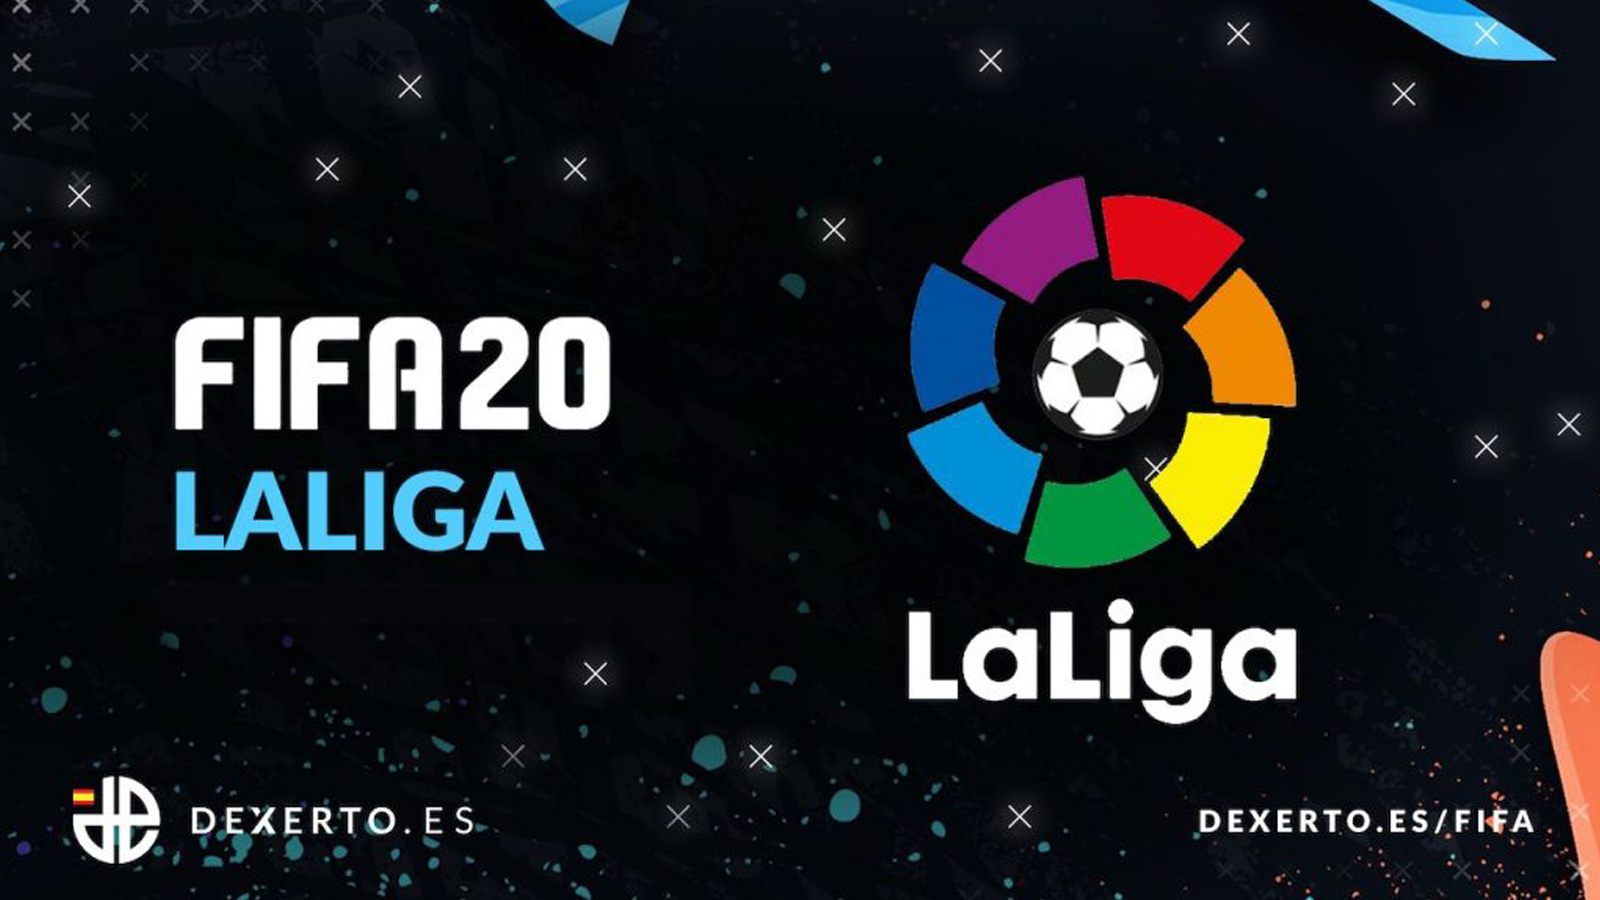 EA Sports/Dexerto